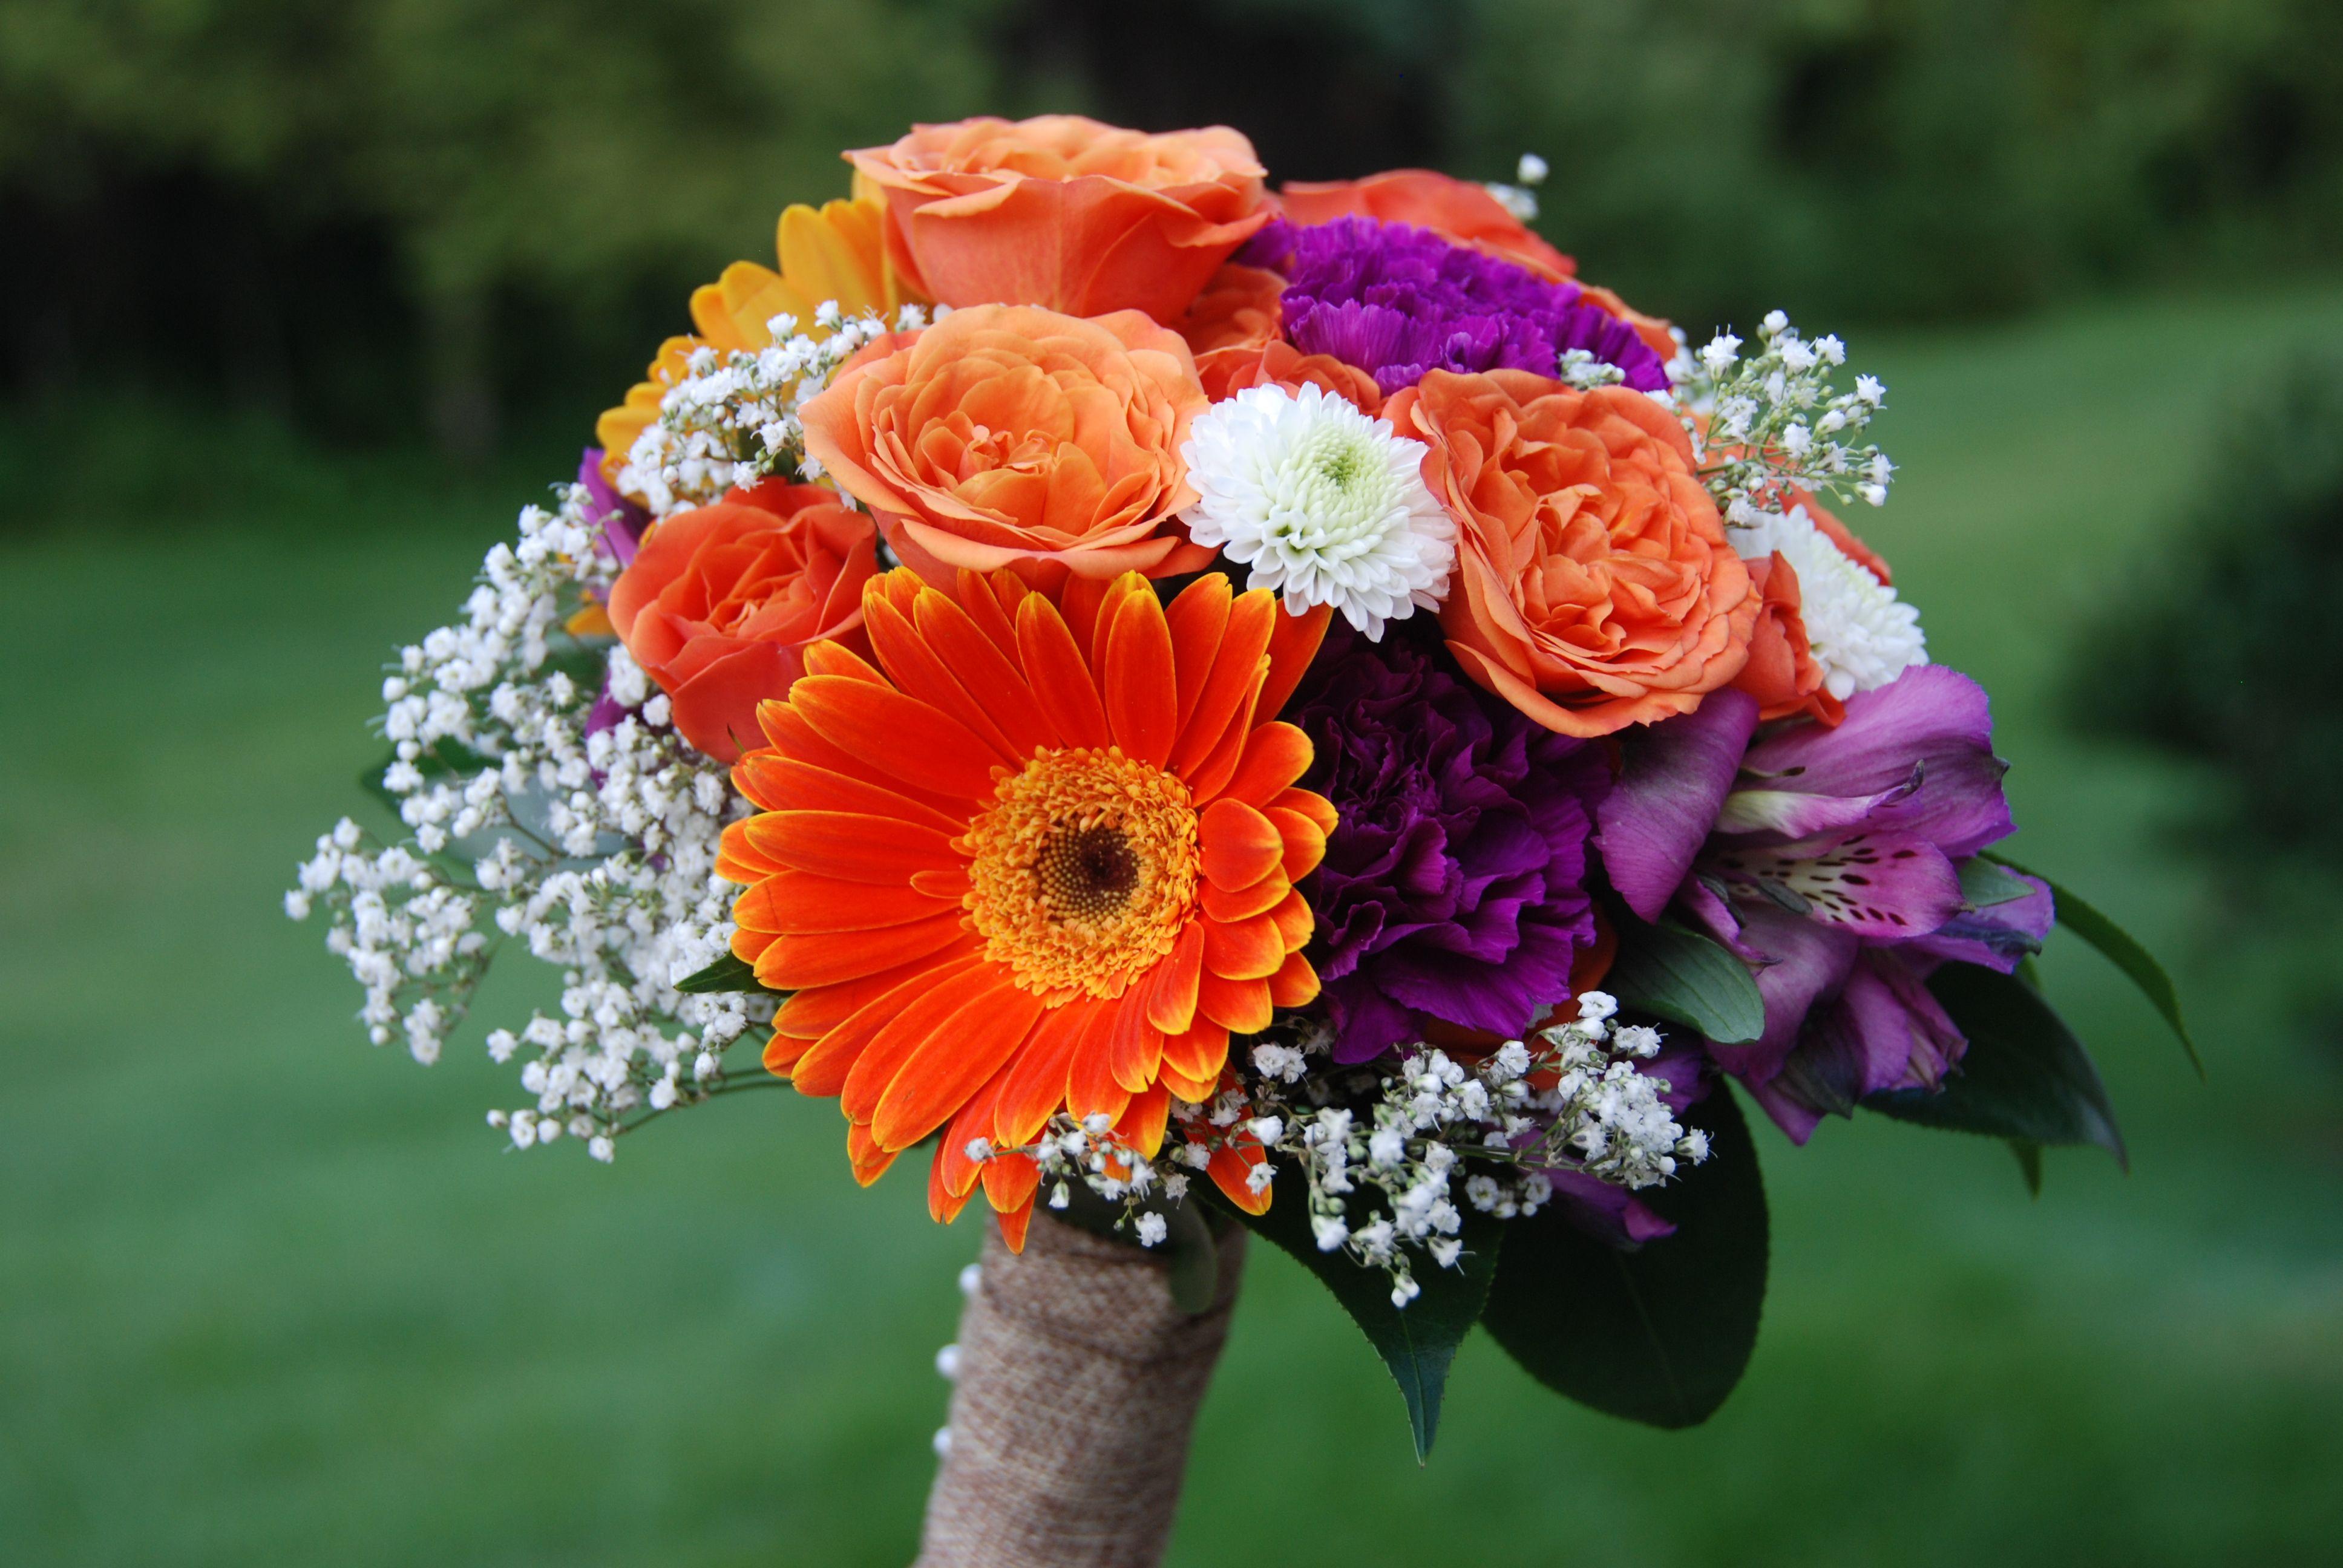 Fall wedding bouquet idea: Gerbera daisies, roses, babies breath, alstromeria, carnations, mums